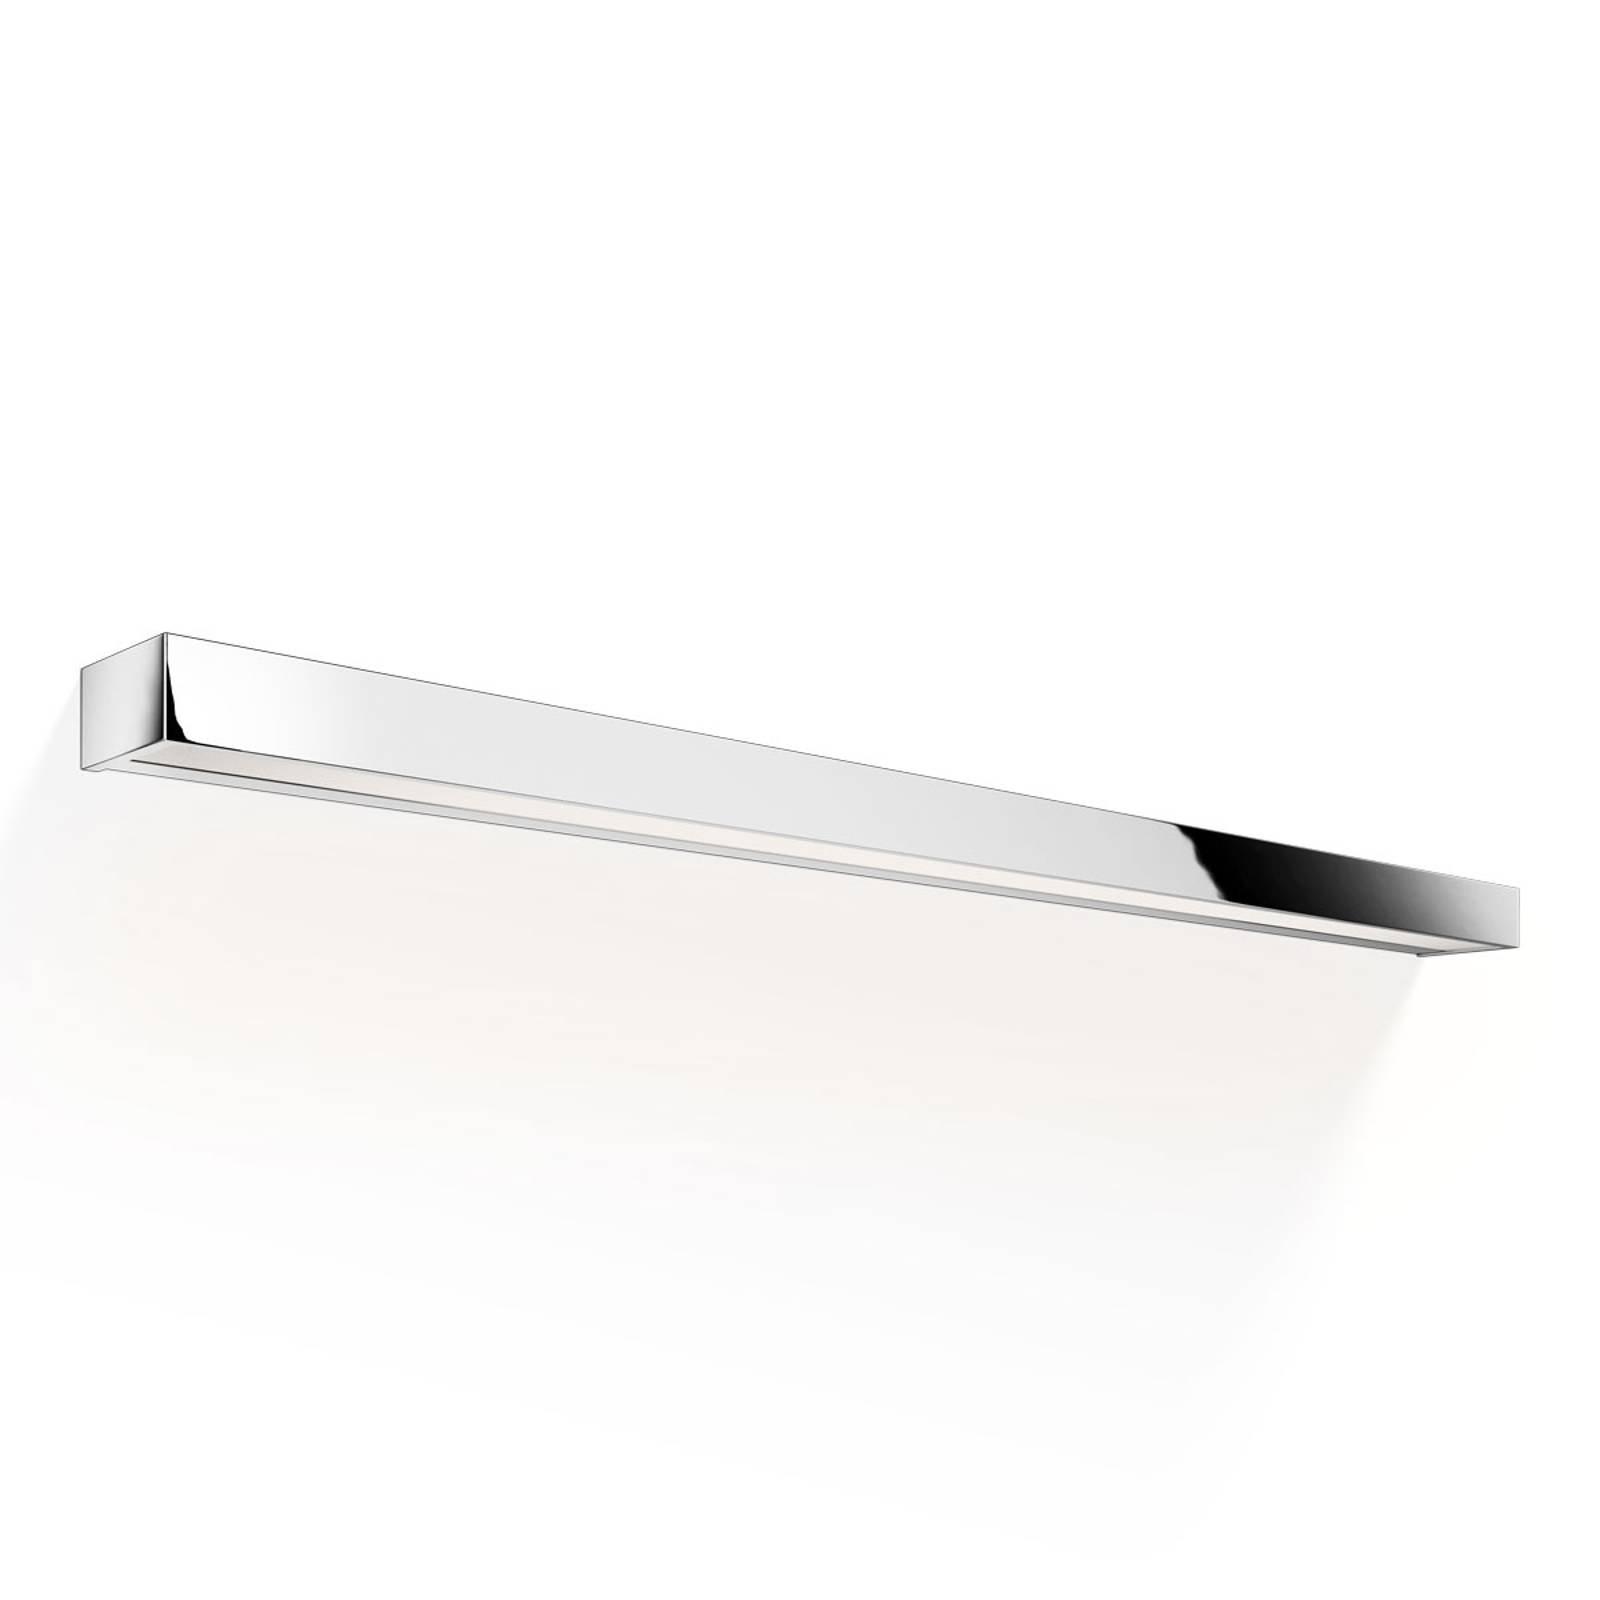 Decor Walther Box 120 N LED-vegglampe 2 700 K